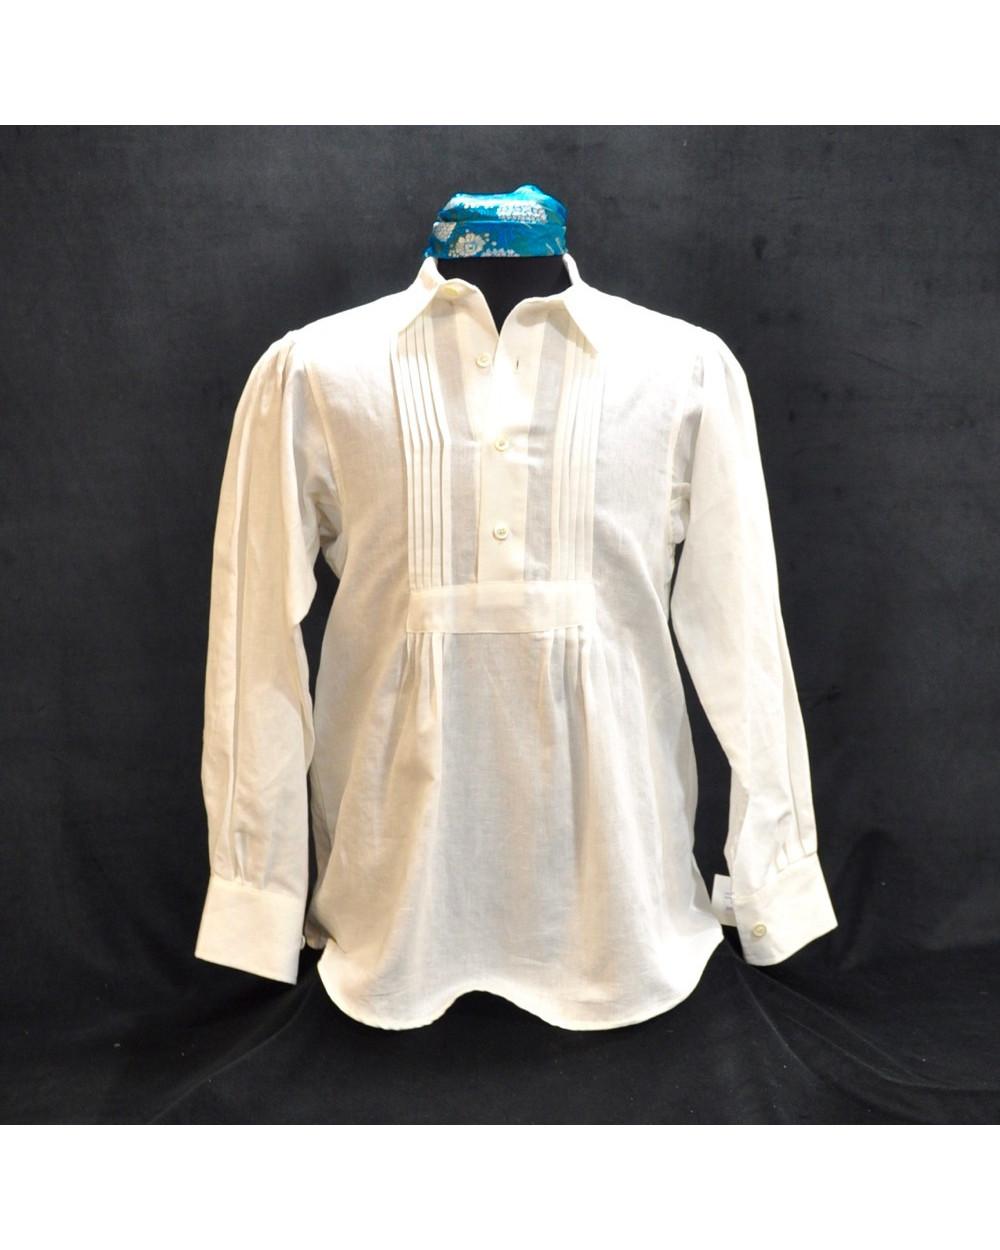 Comprar Camisa regional BASE de ZARZOSO online